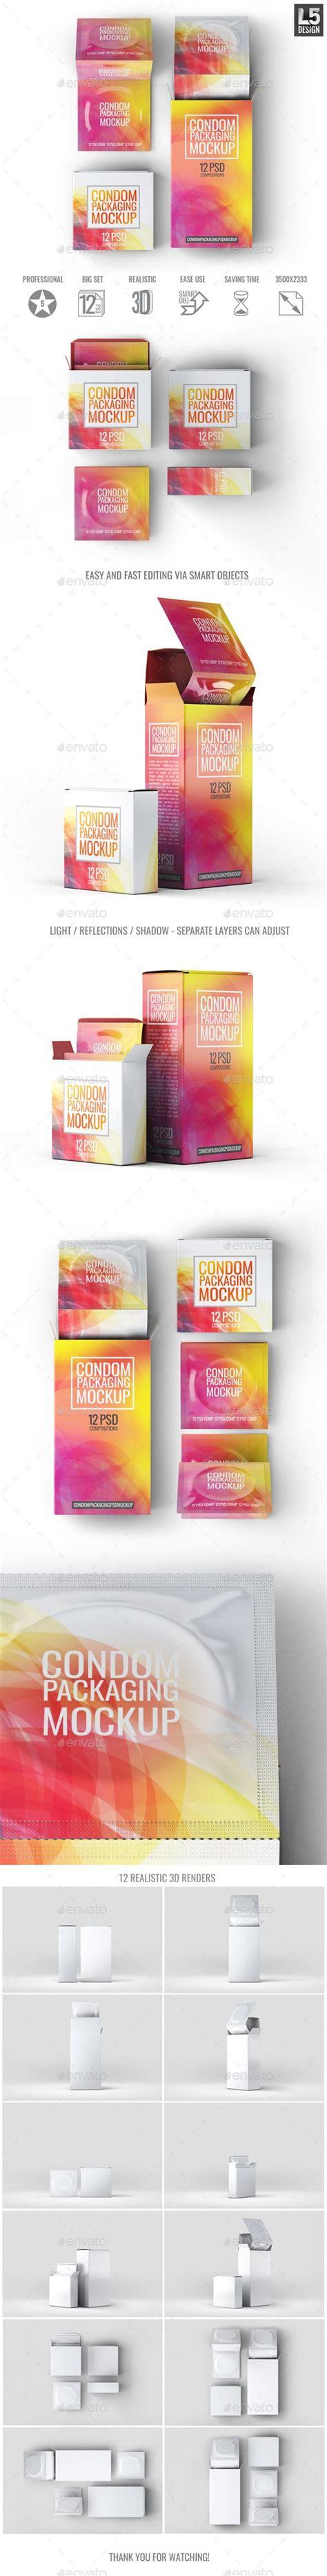 condom box template 37 best condoms images on pinterest design packaging